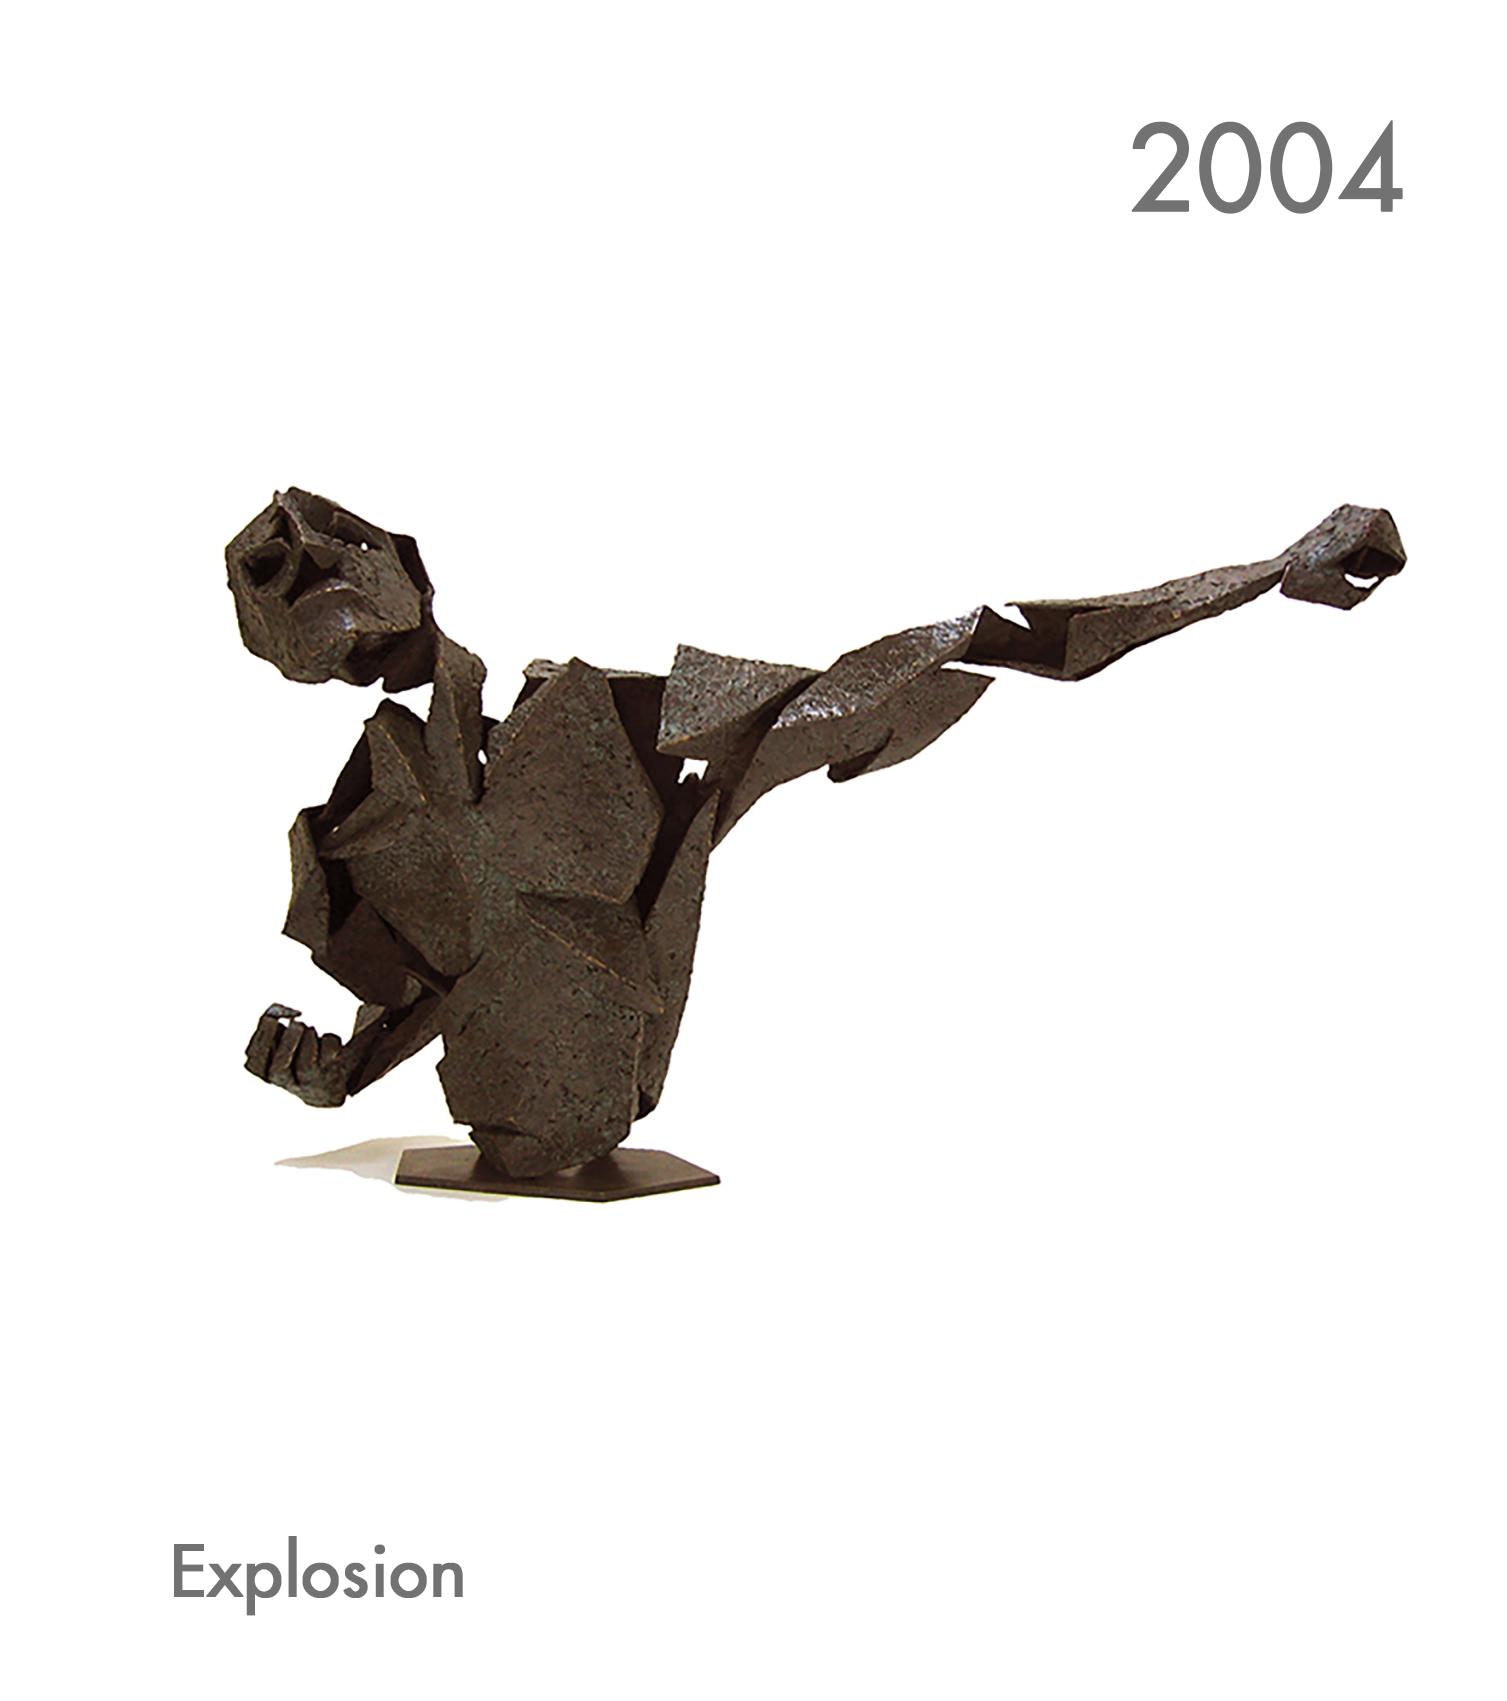 2004 Explosion copy2.jpg